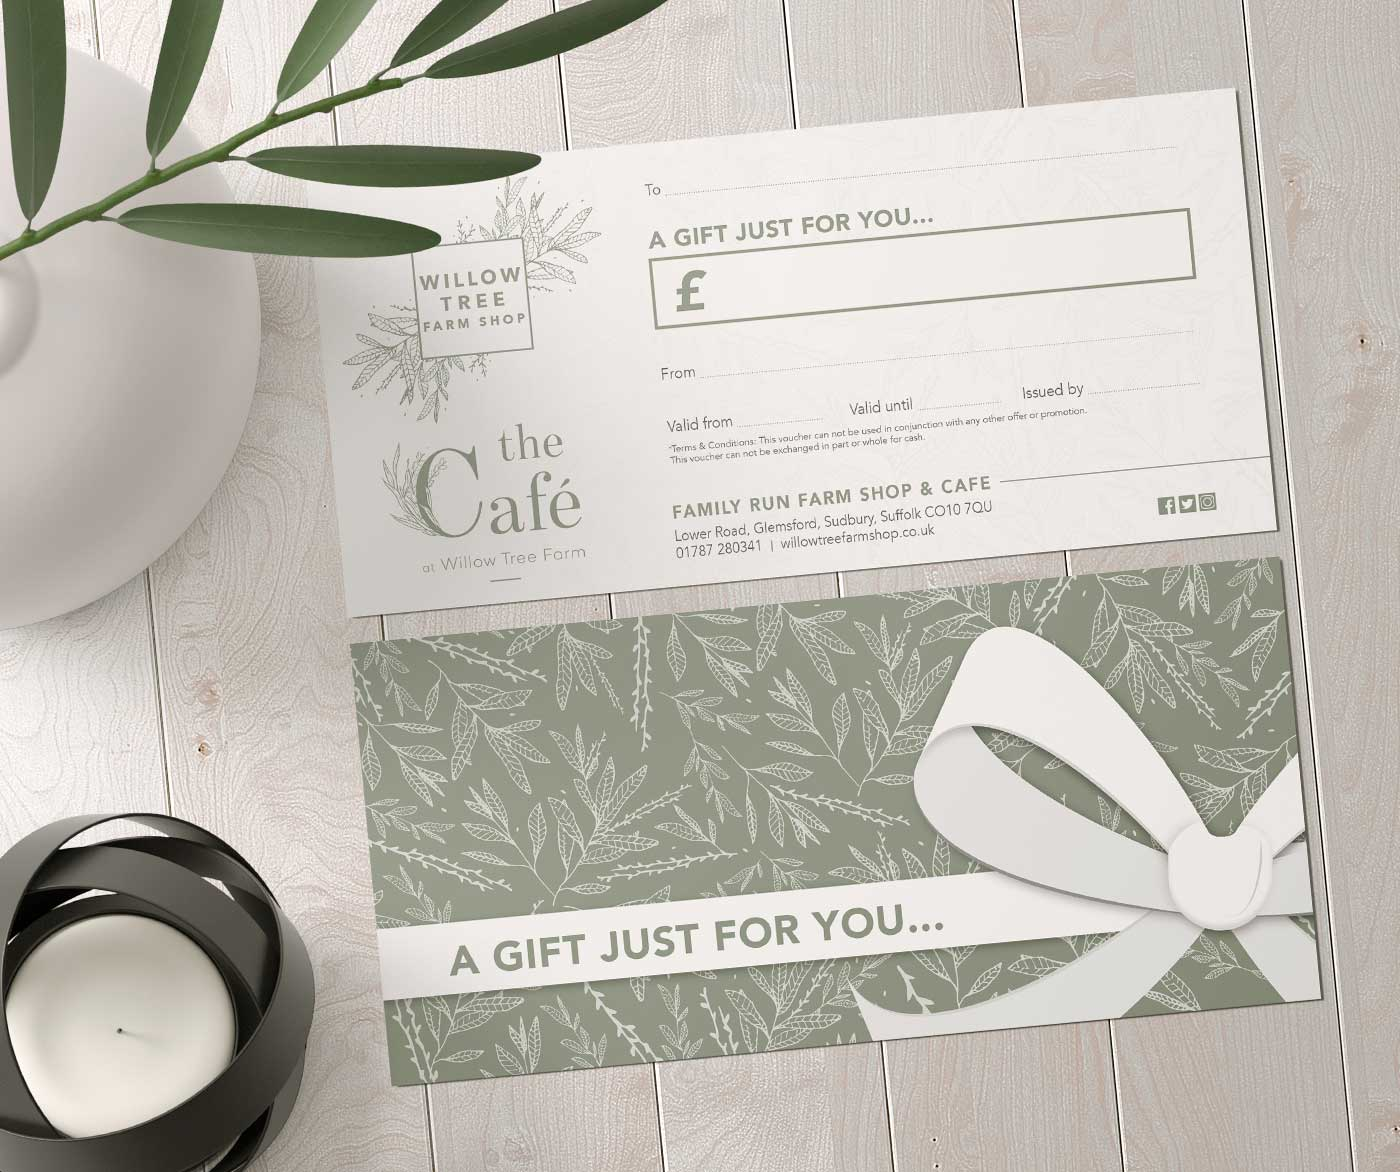 Willow Tree Farm Shop - Gift Voucher